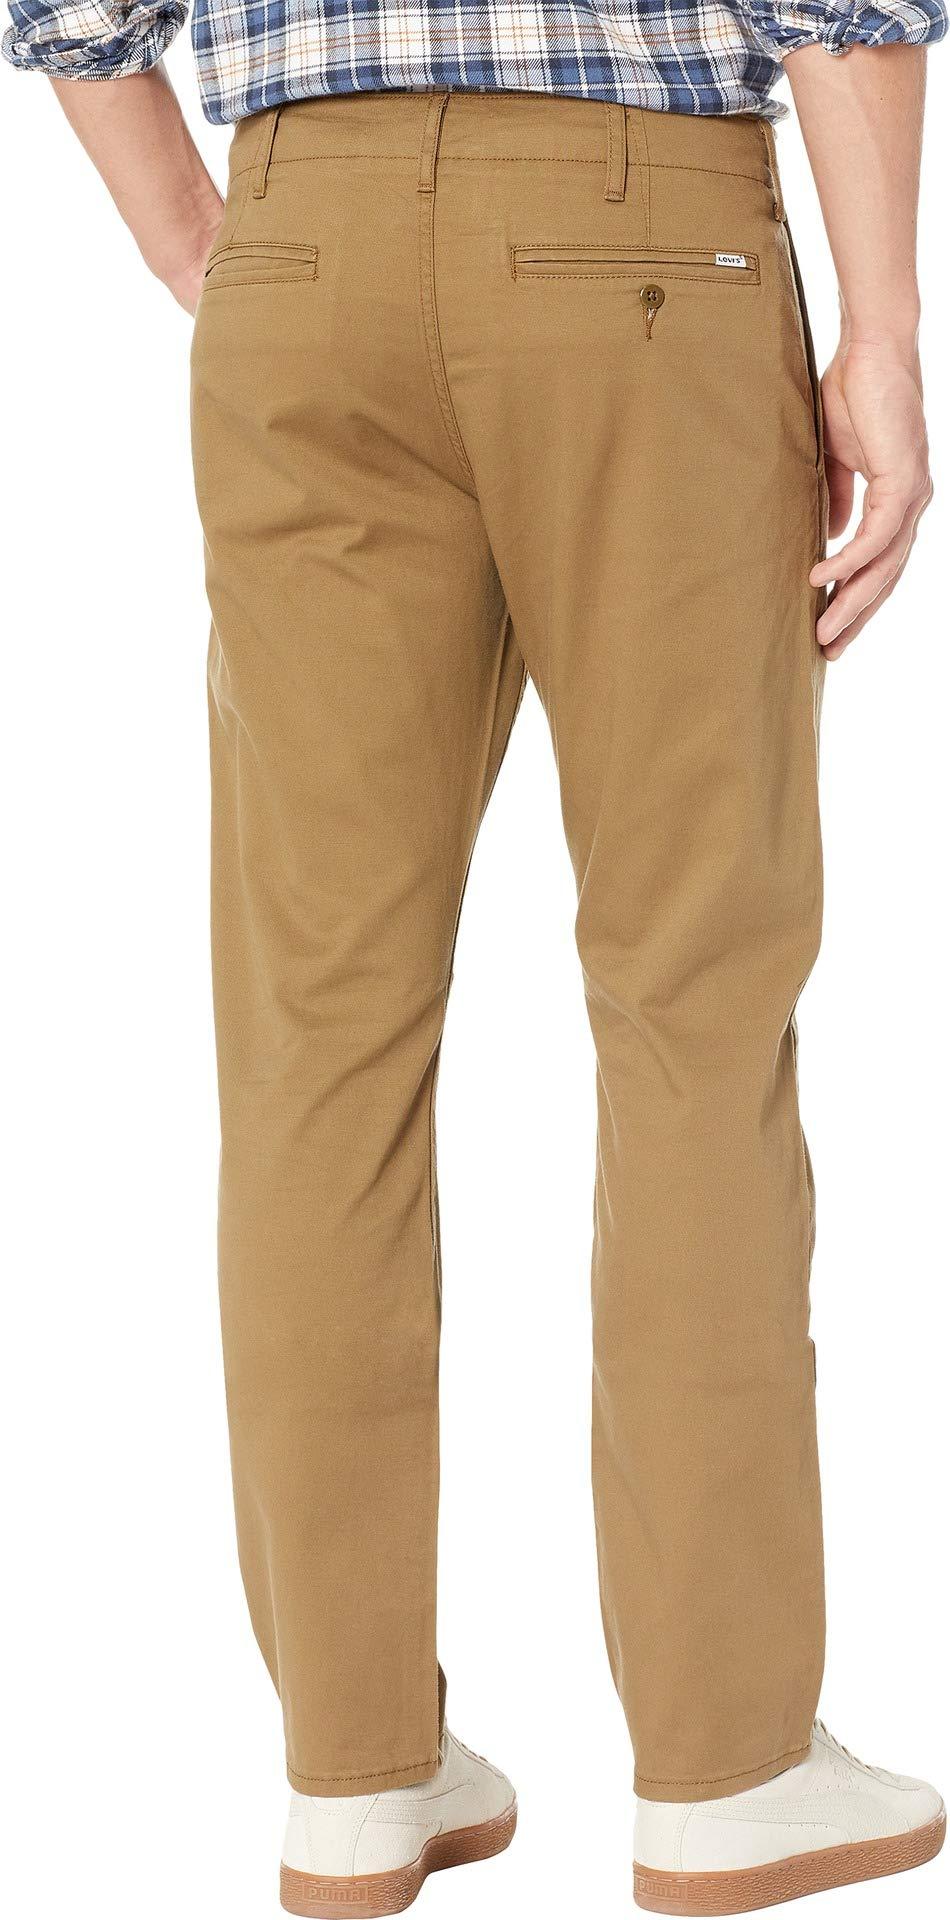 733001a59f7 Levi's Men's 502 Regular Taper Fit Chino Pant | Jodyshop